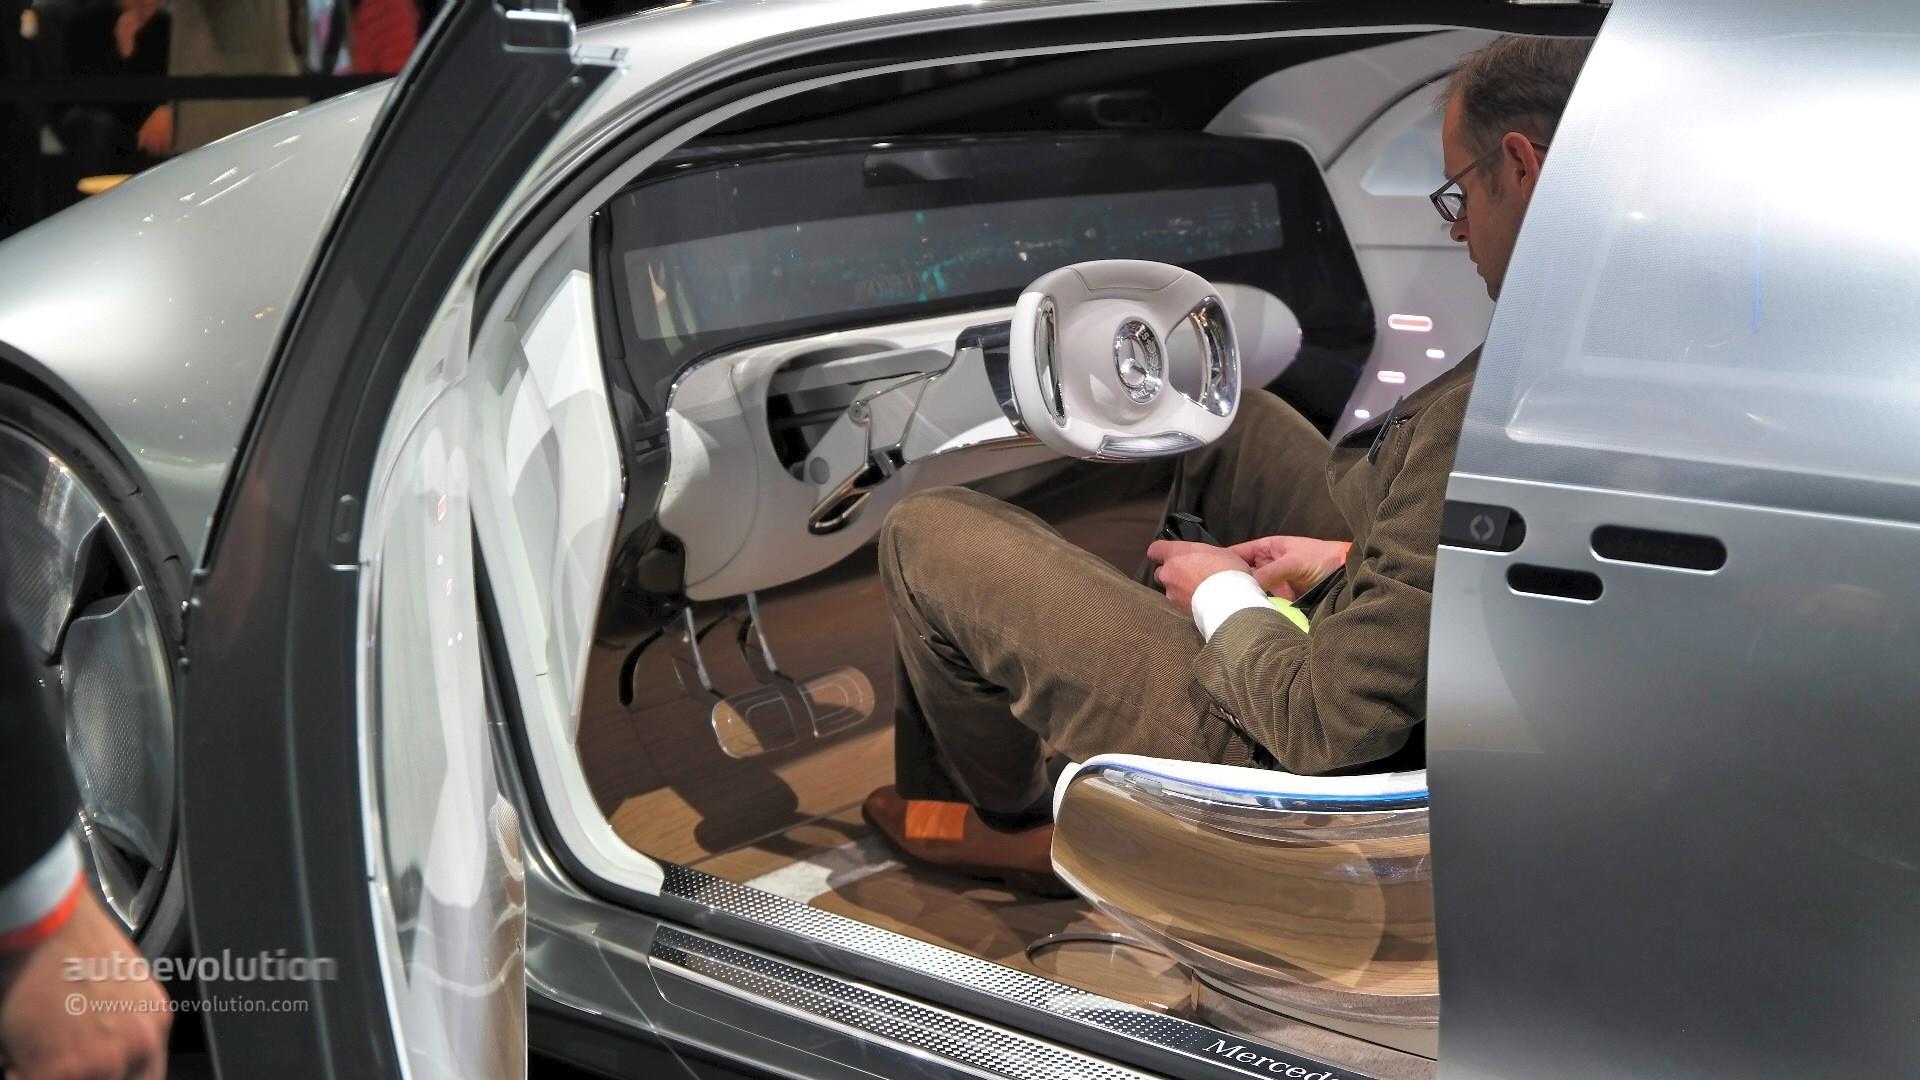 Mercedes F 015 >> Mercedes-Benz F 015 Concept Previews the Future at 2015 NAIAS [Live Photos] - autoevolution